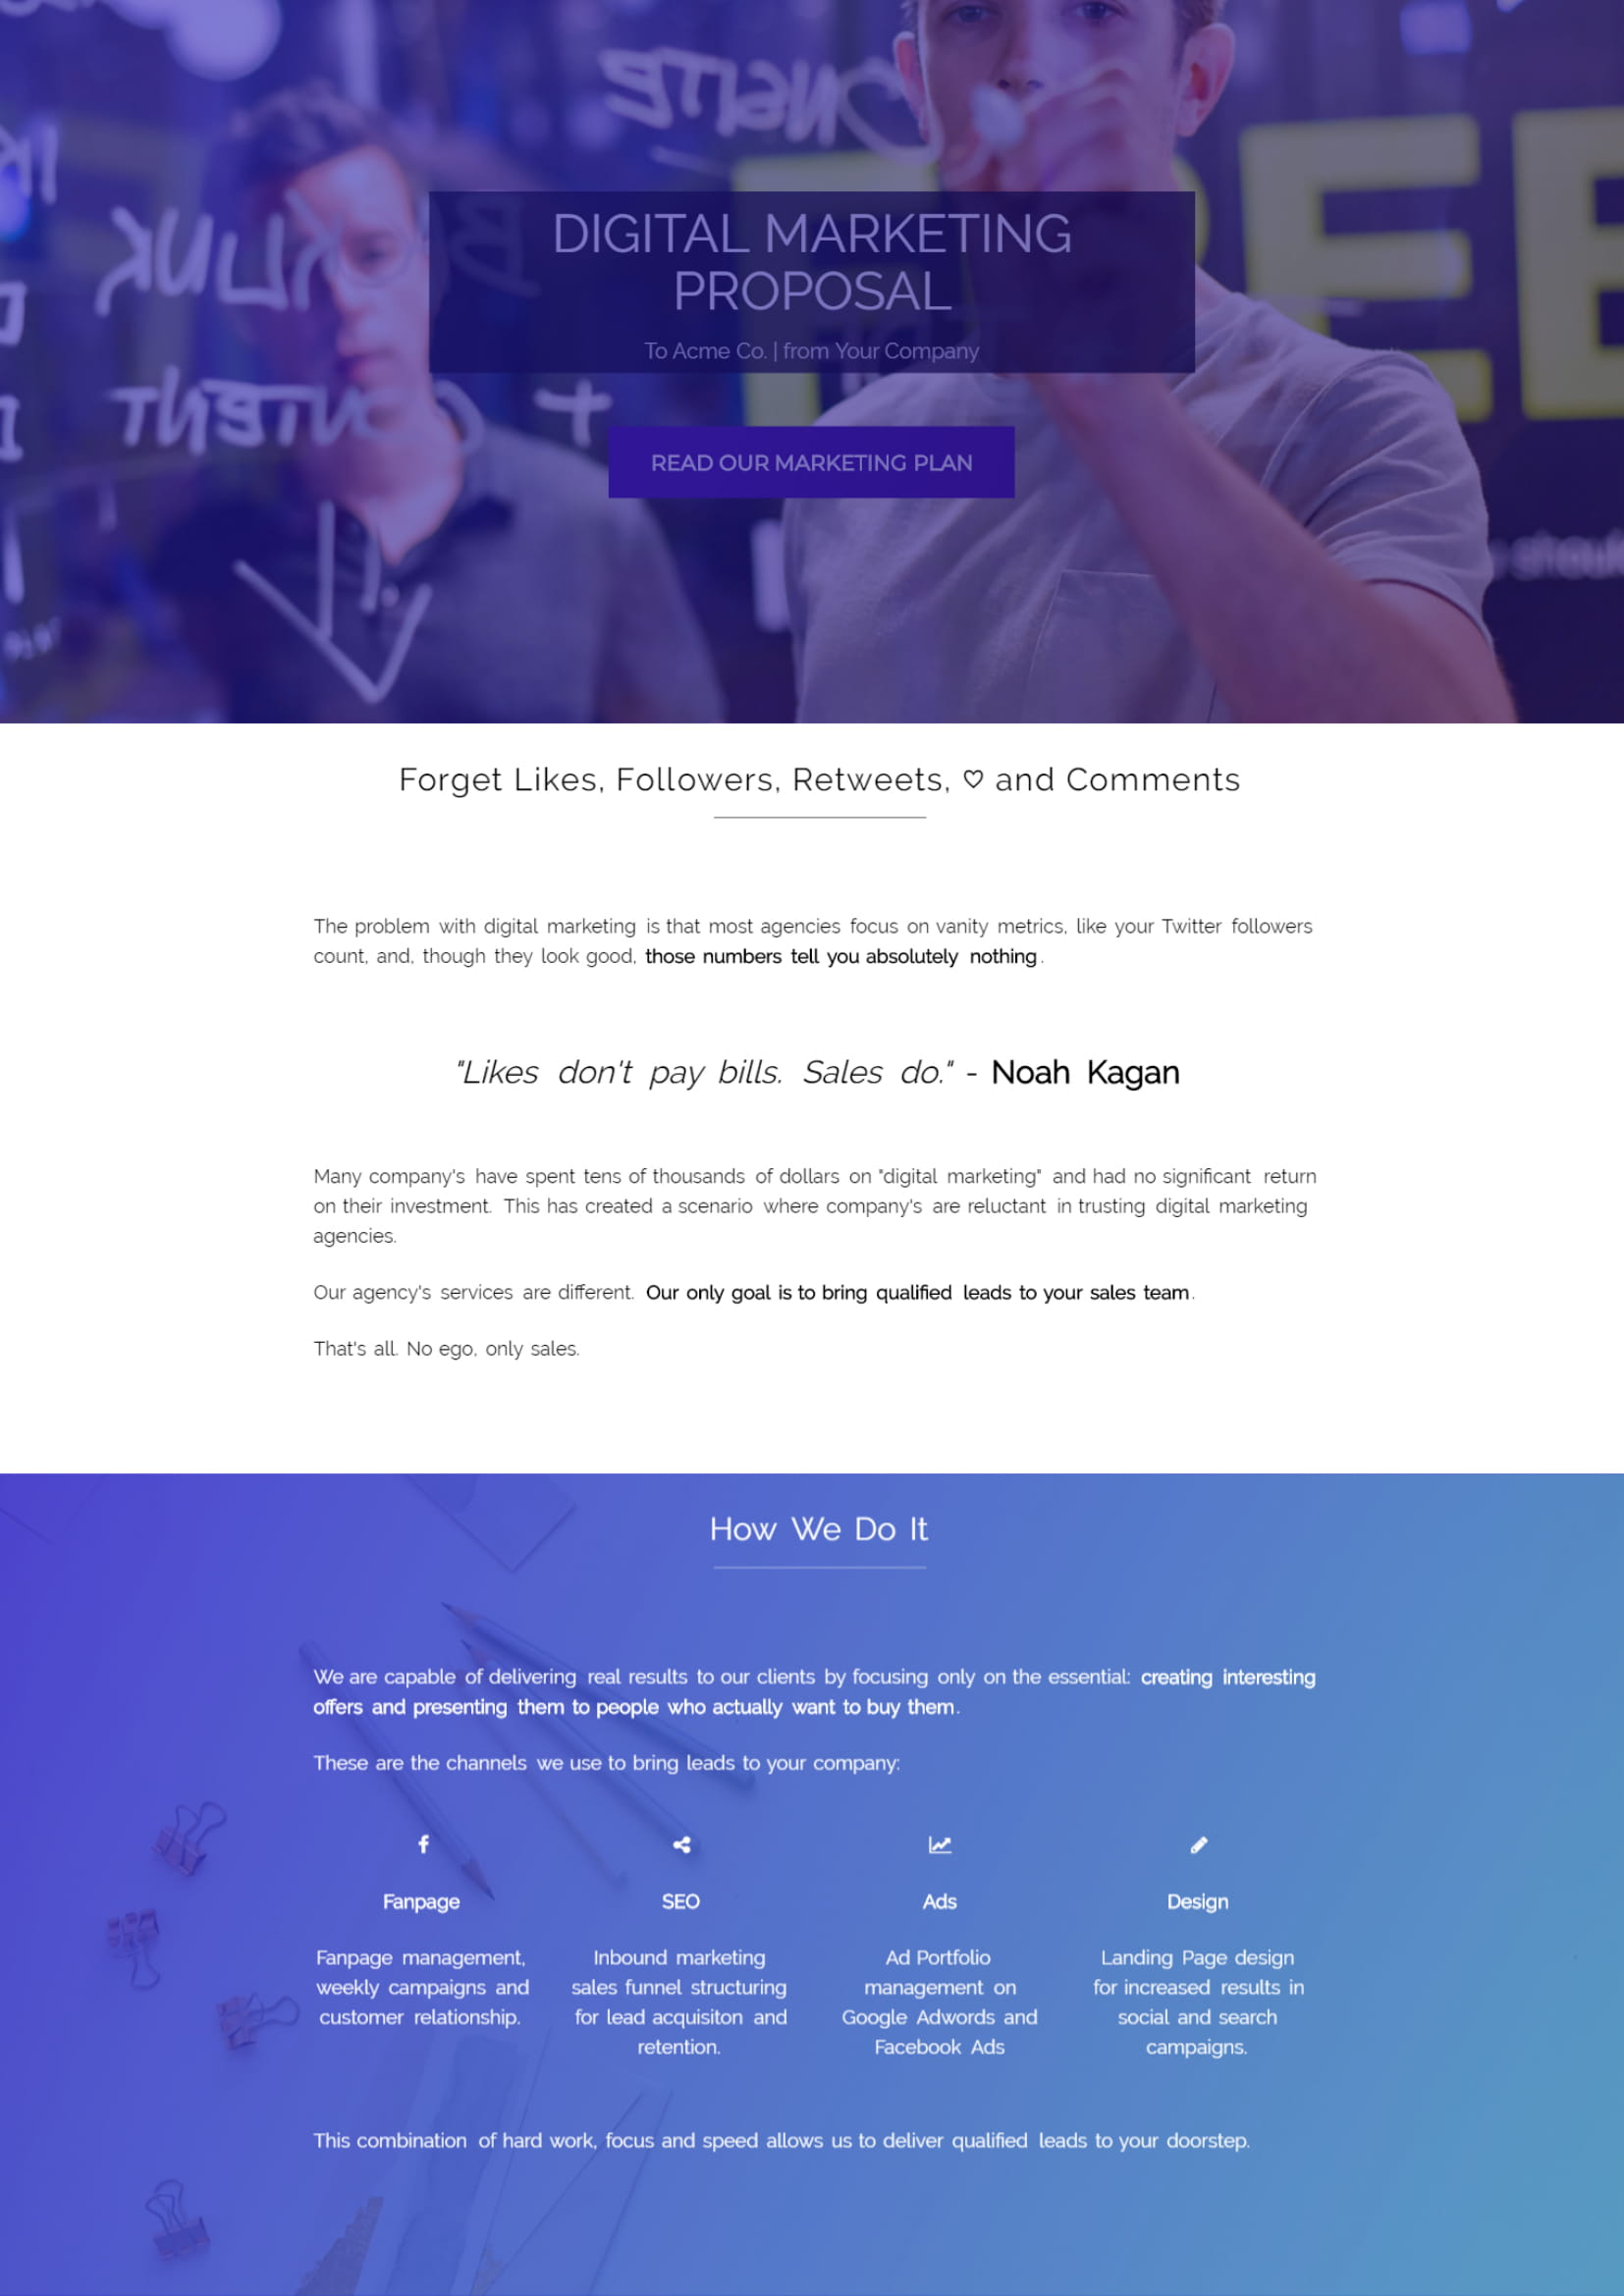 proposta-marketing-digital-2